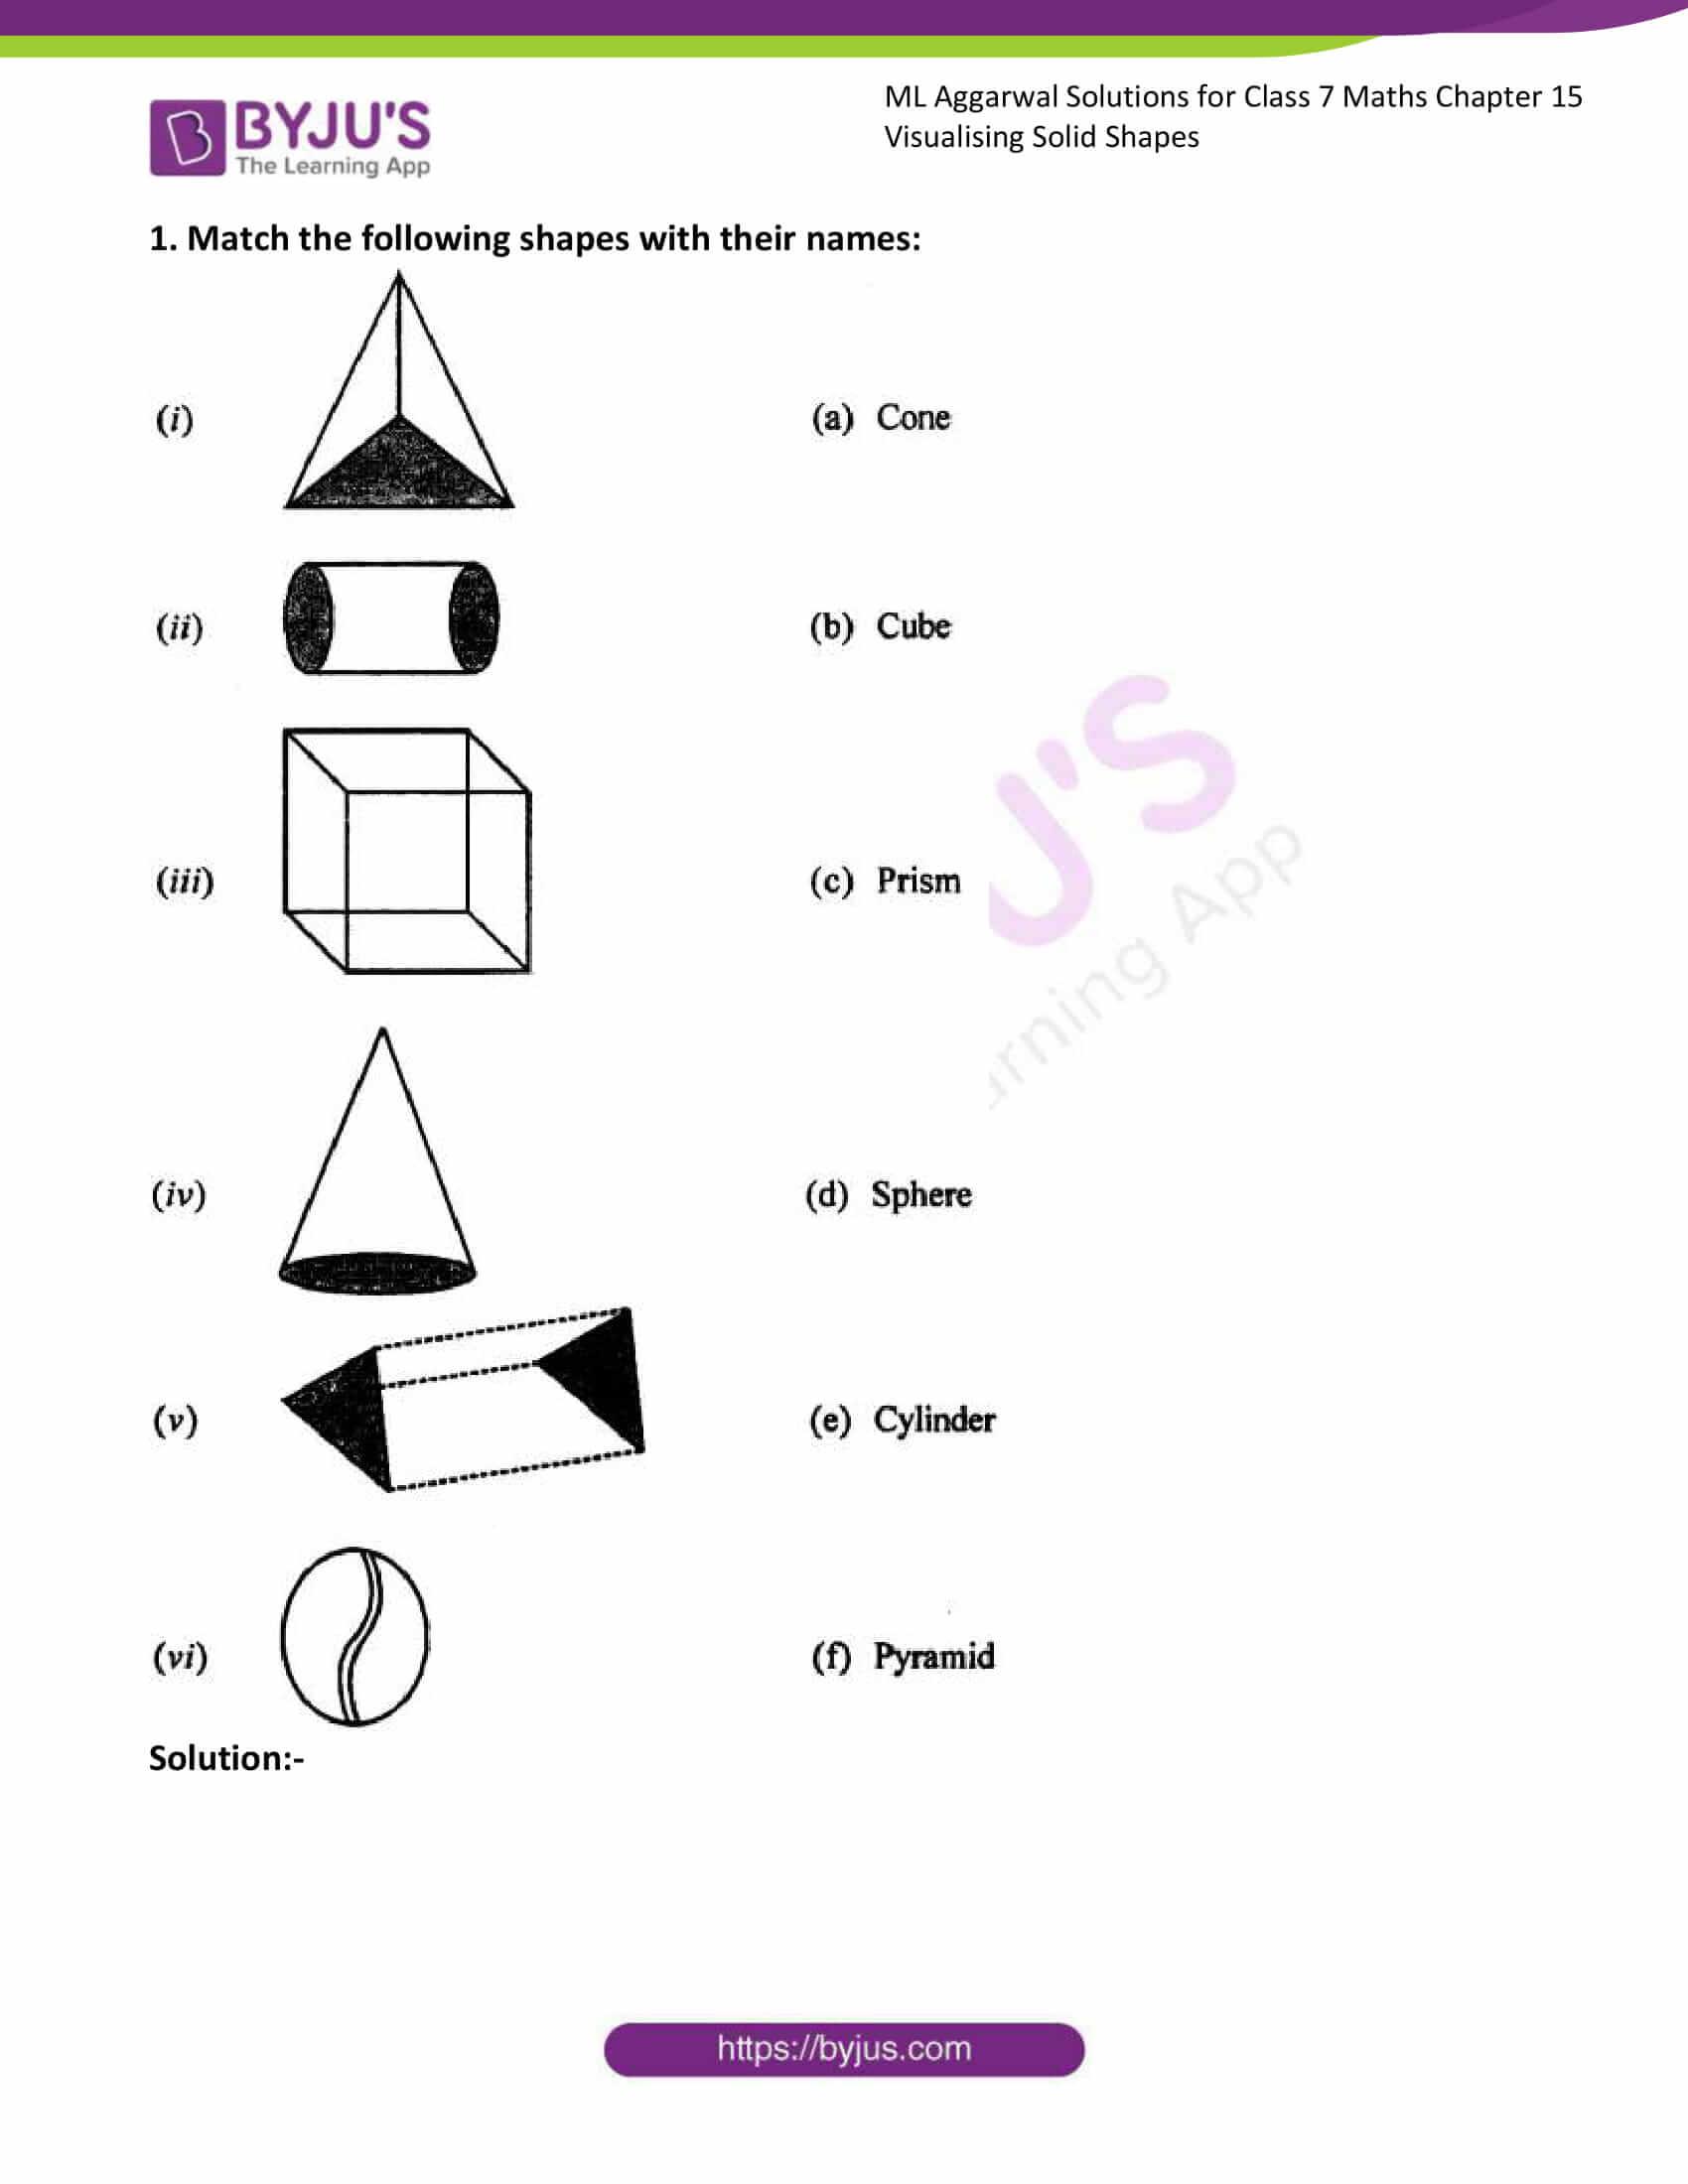 ml aggarwal sol class 7 maths chapter 15 1